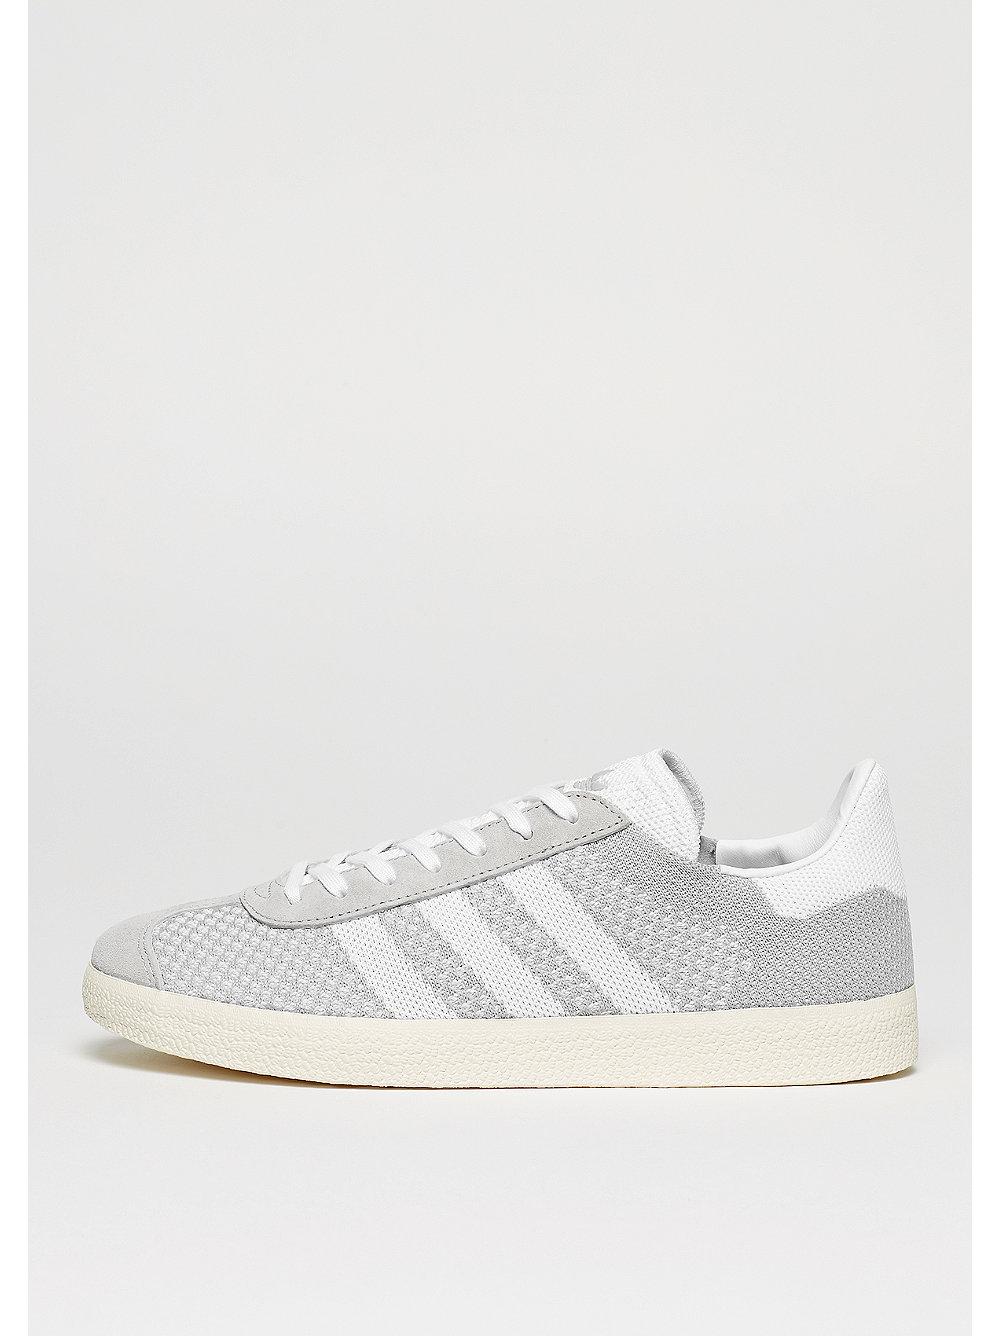 adidas Gazelle PK clear onix-ftwr white-chalk white